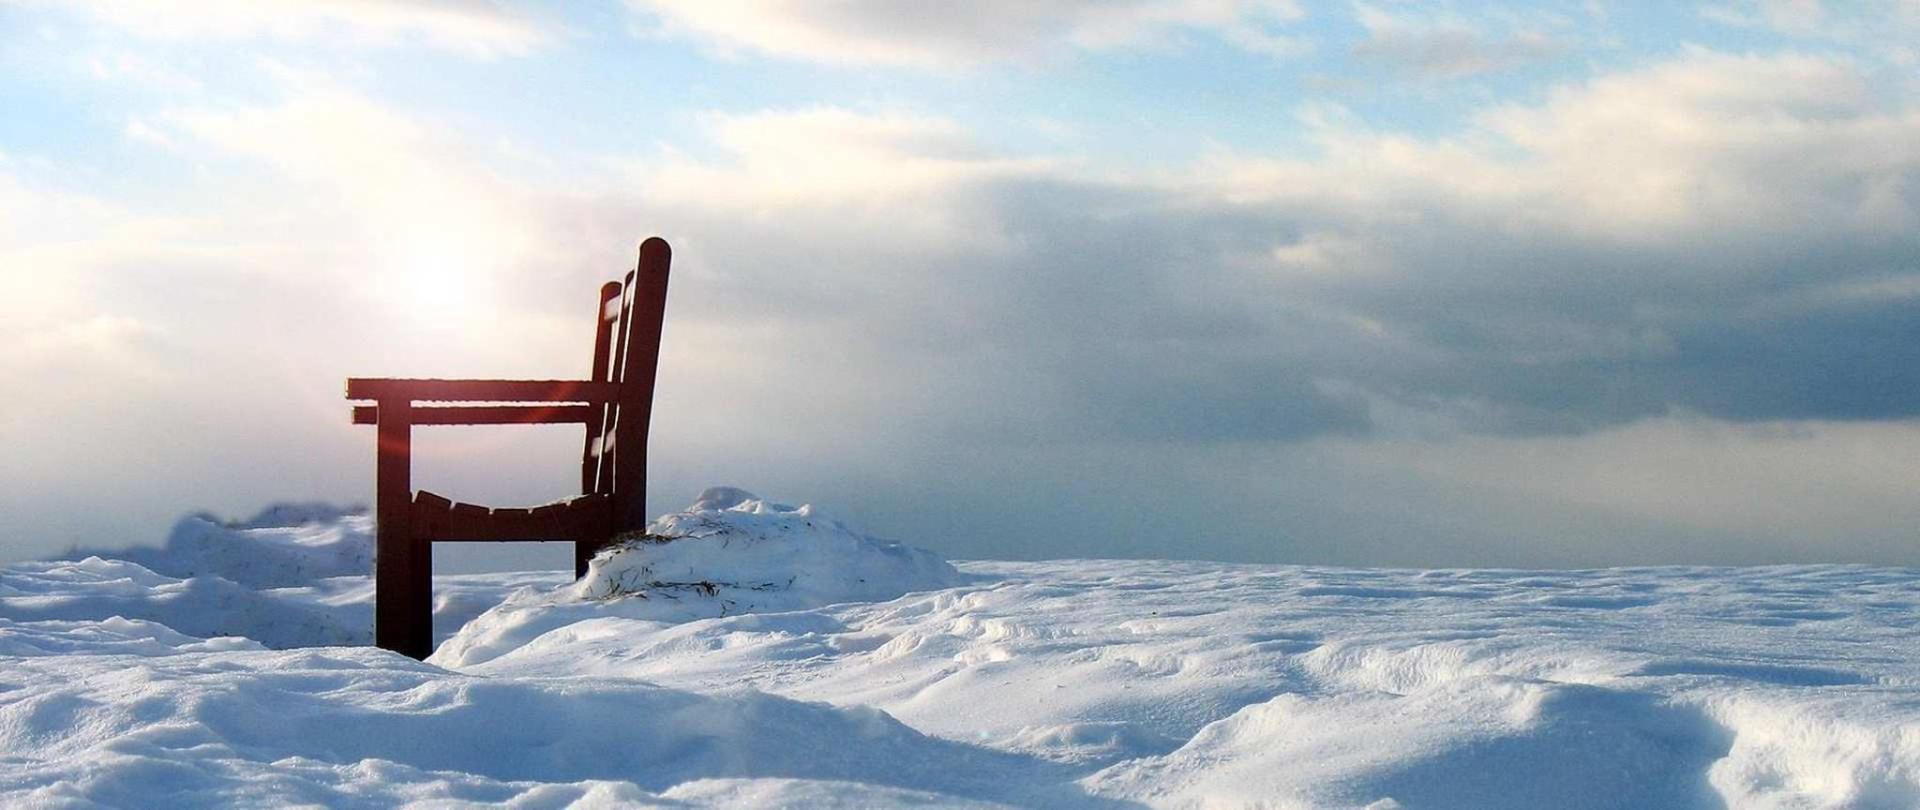 inn-winter-christmas-006.jpg.1920x810_0_4_10666.jpeg.1920x0.jpeg